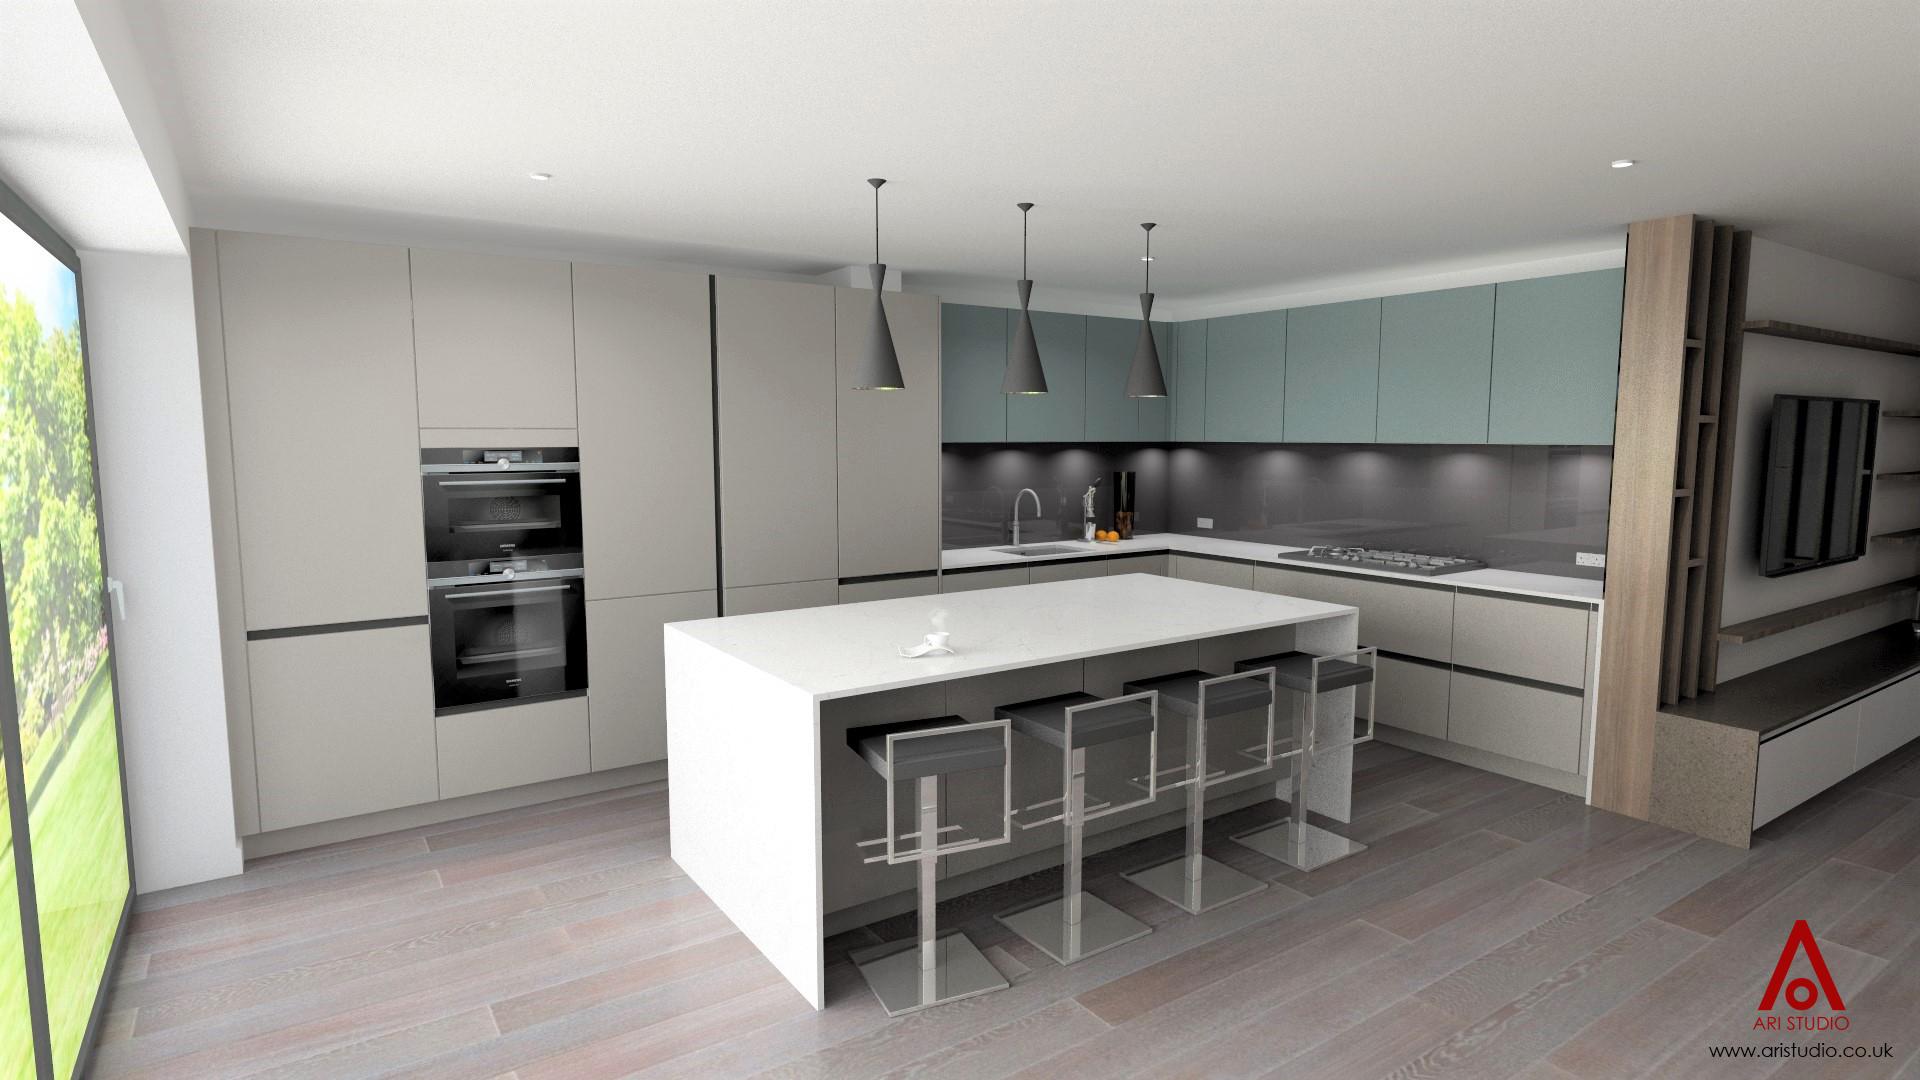 Ari Studio Pronorm Kitchens